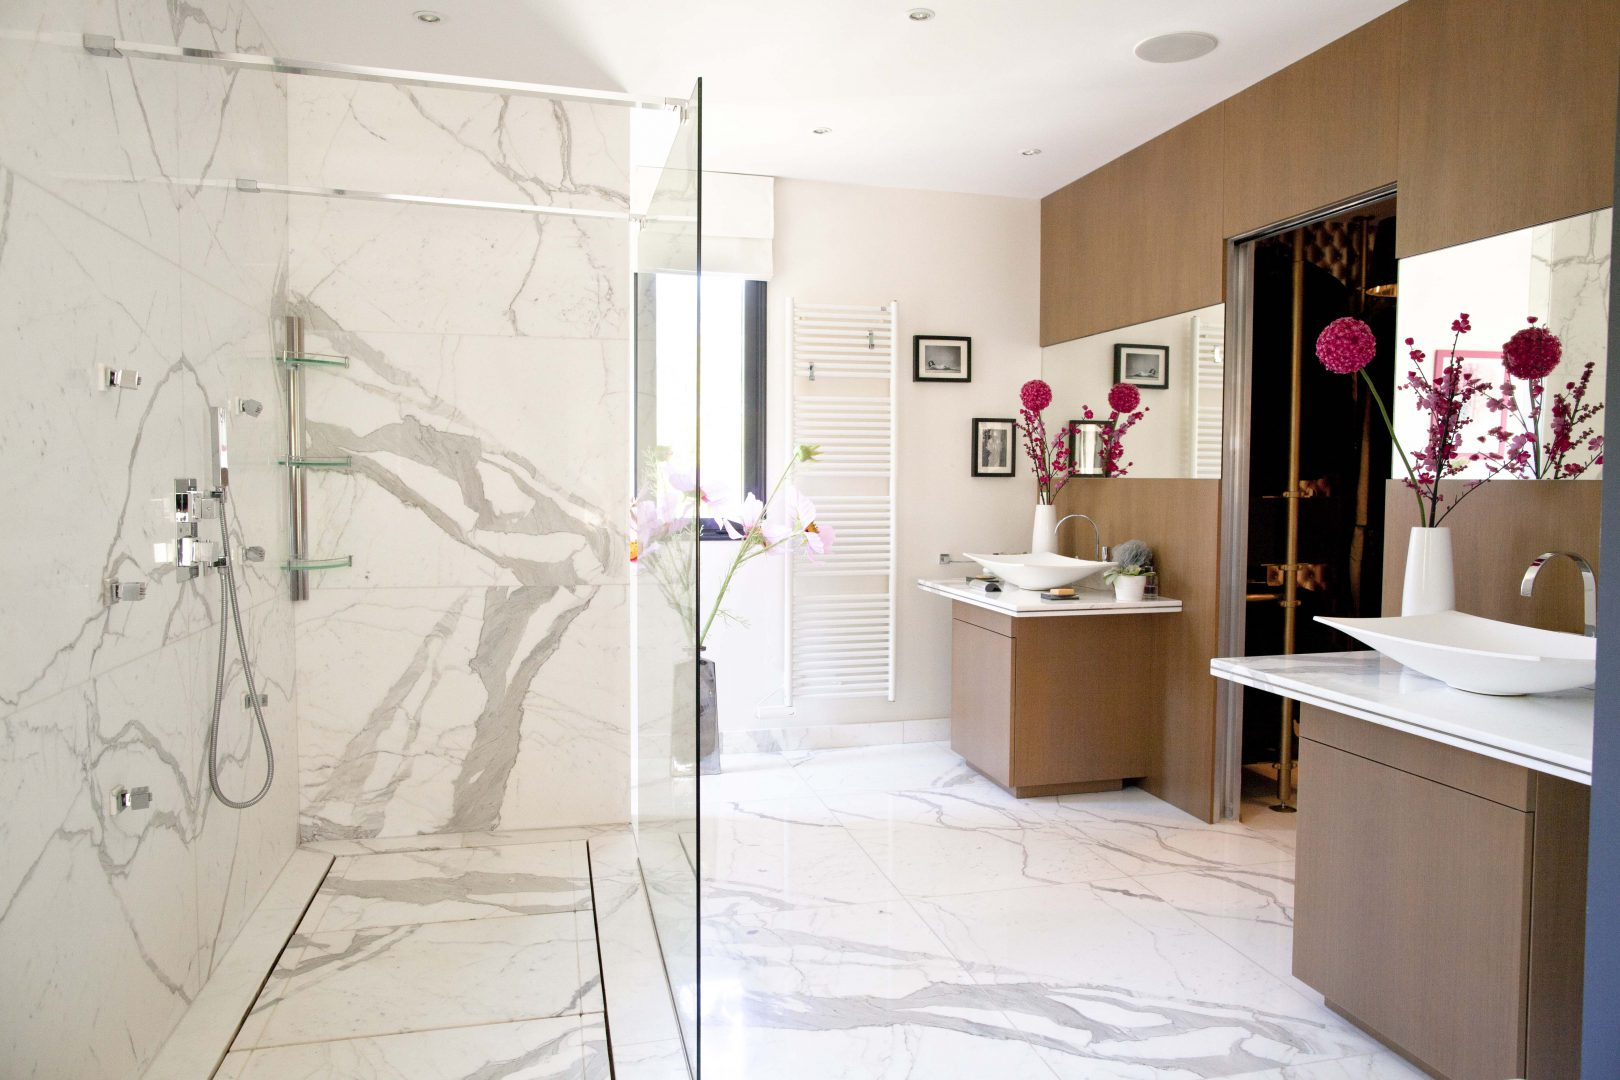 salles de bains mpg marbre pierre